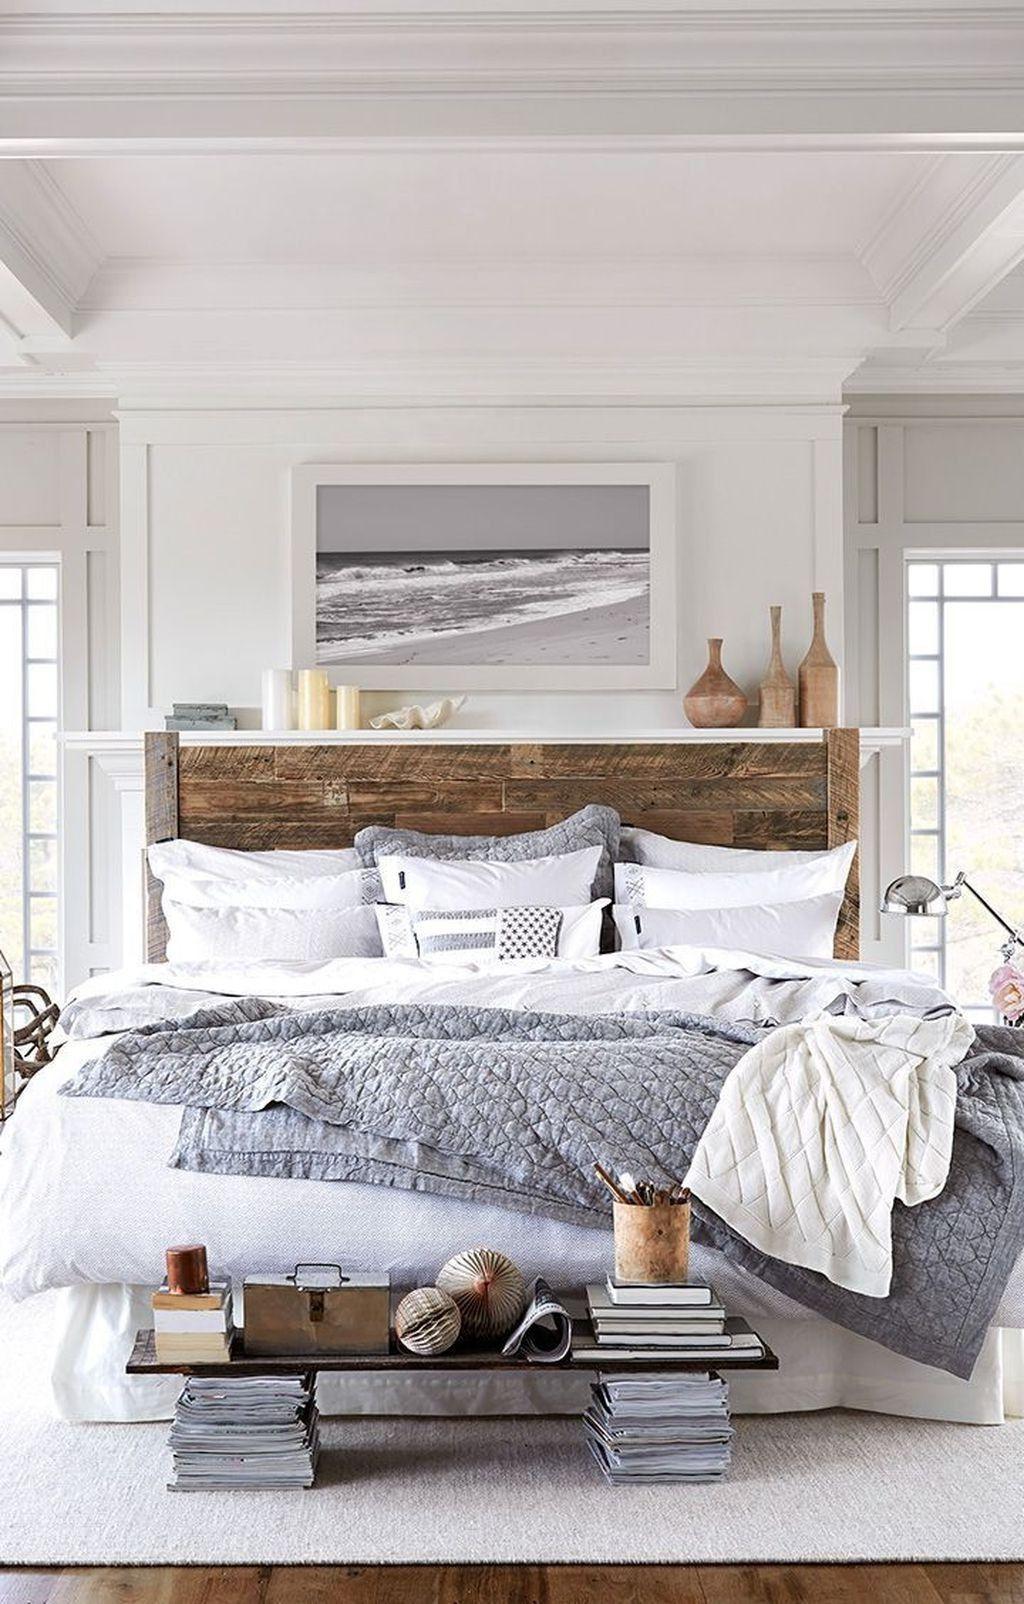 Luxury Small Bedroom Design And Decorating For Comfortable Sleep Ideas Bedroom Design Master Bedrooms Decor Rustic Bedroom